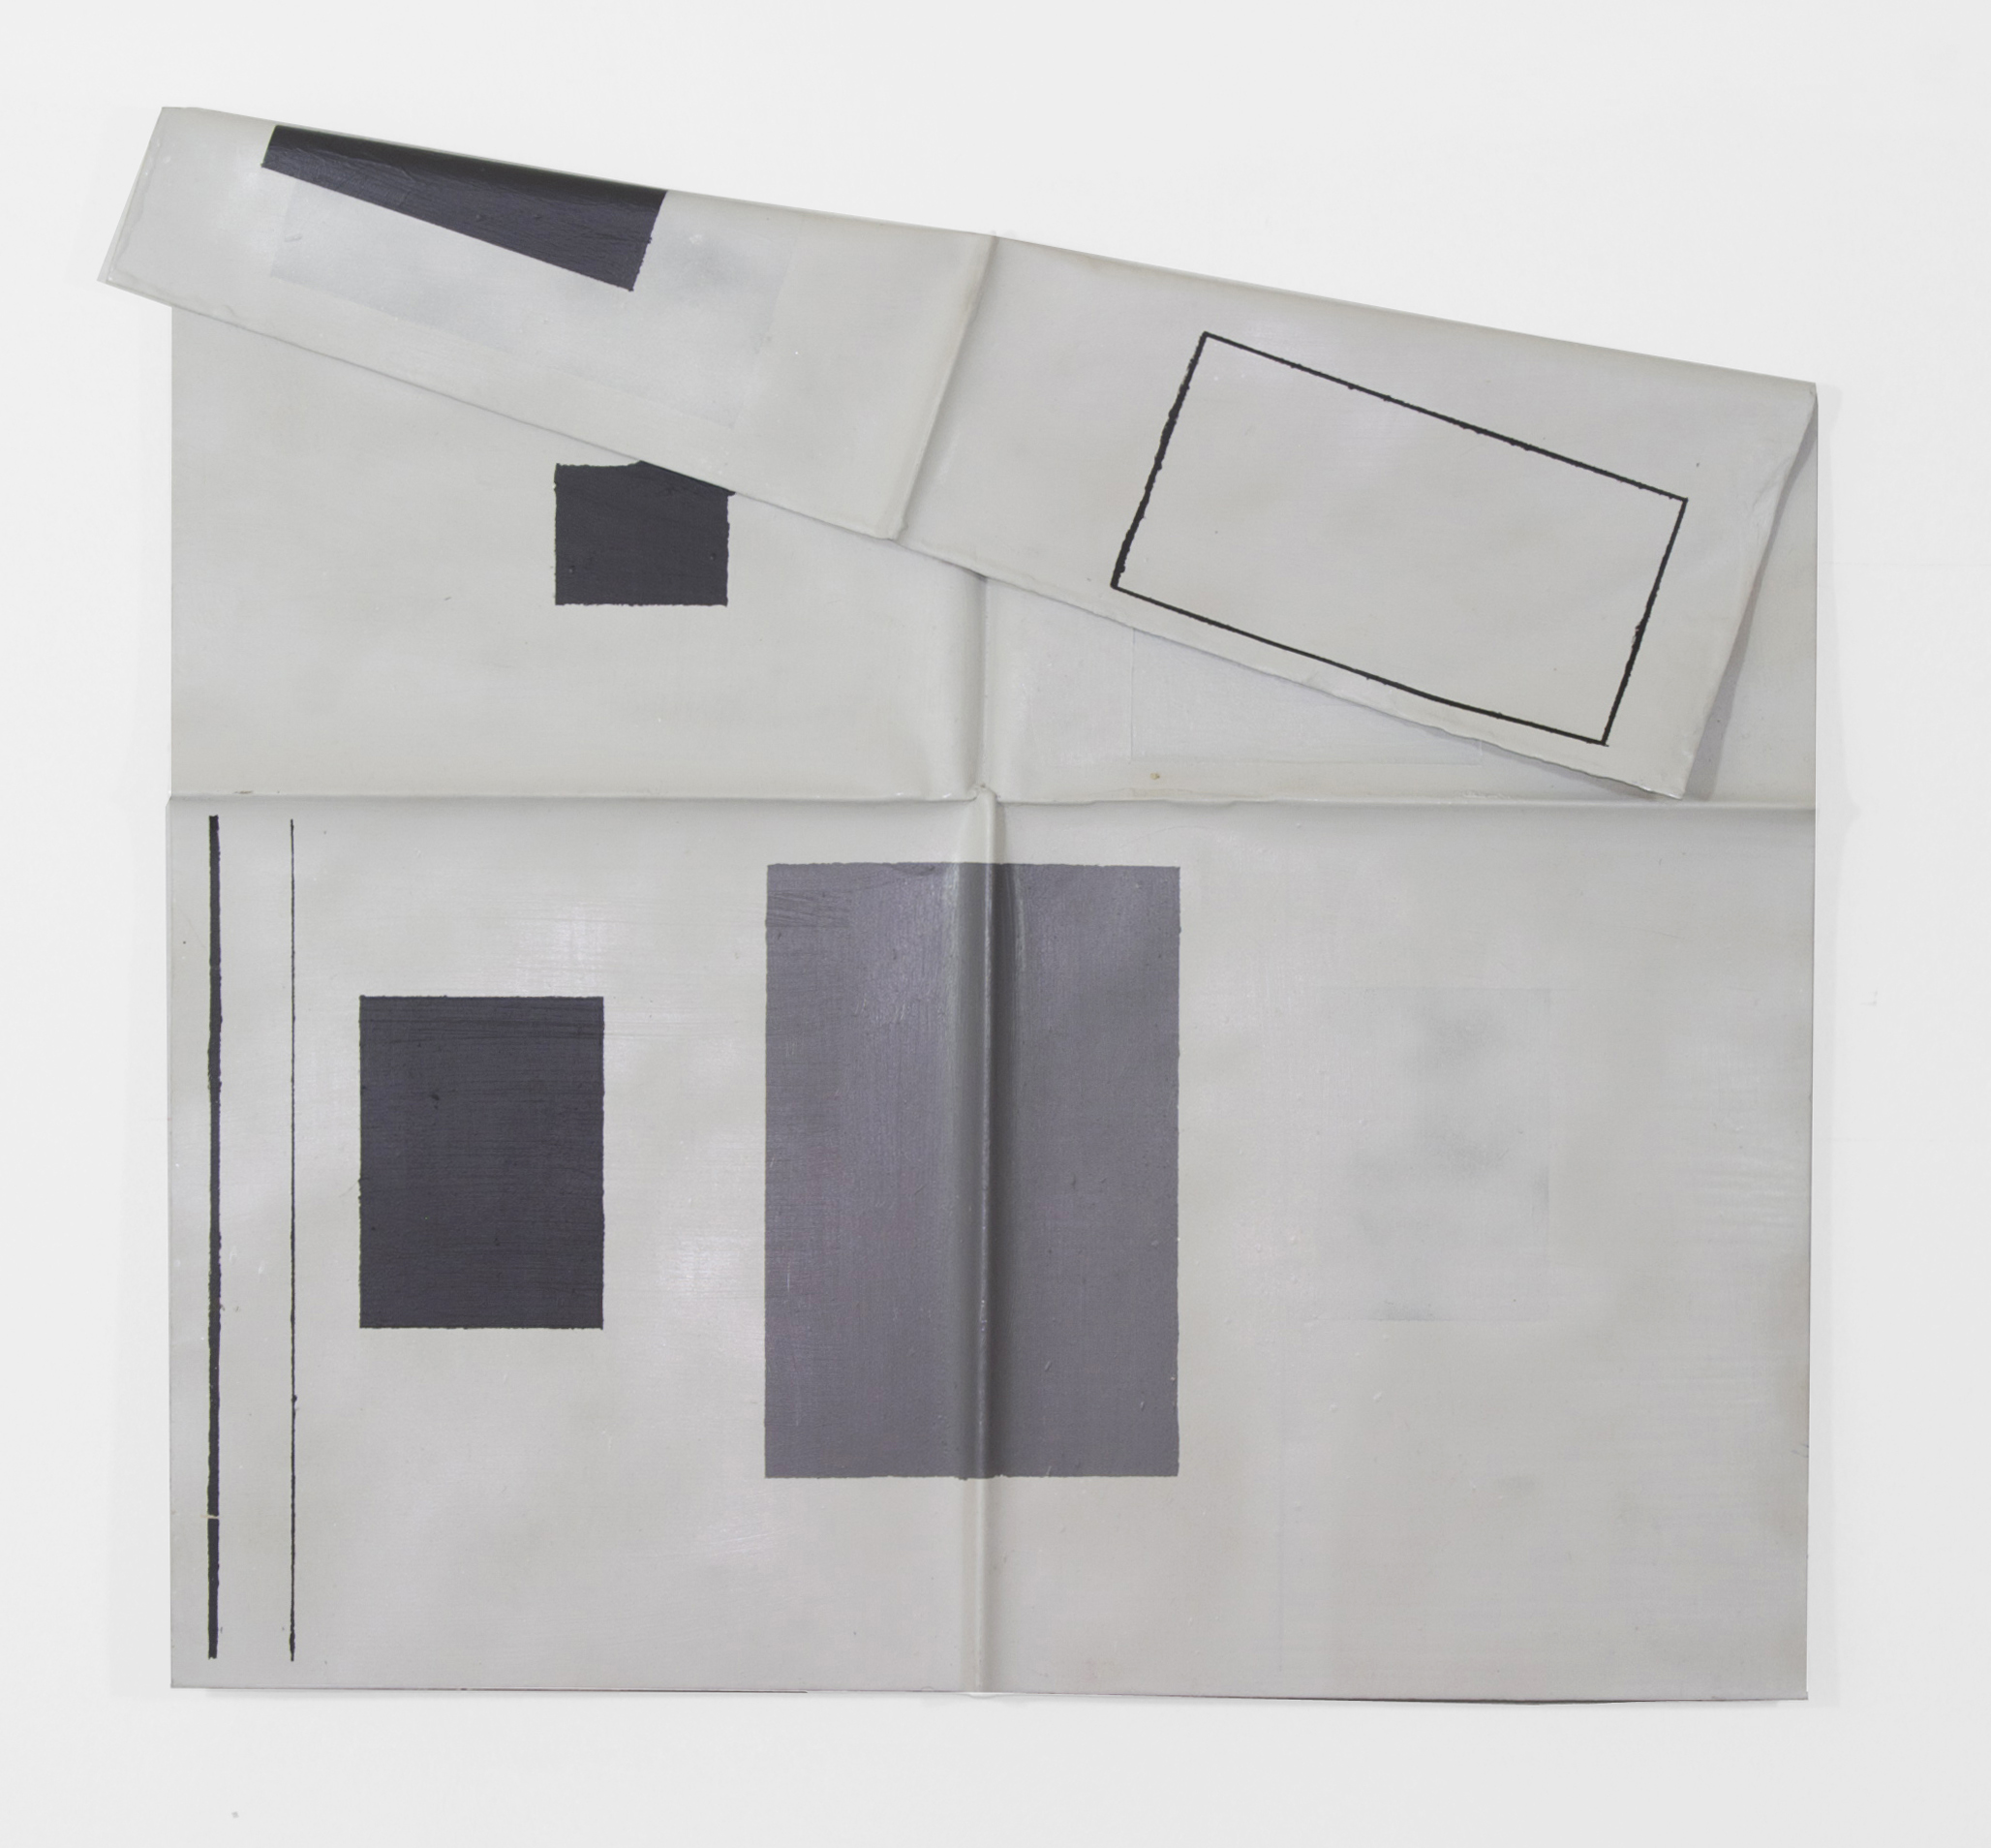 Hamiltonian Gallery_Brian Michael Dunn_News Today_2017_acrylic and enamel on steel_22x21in_1500USD.jpg